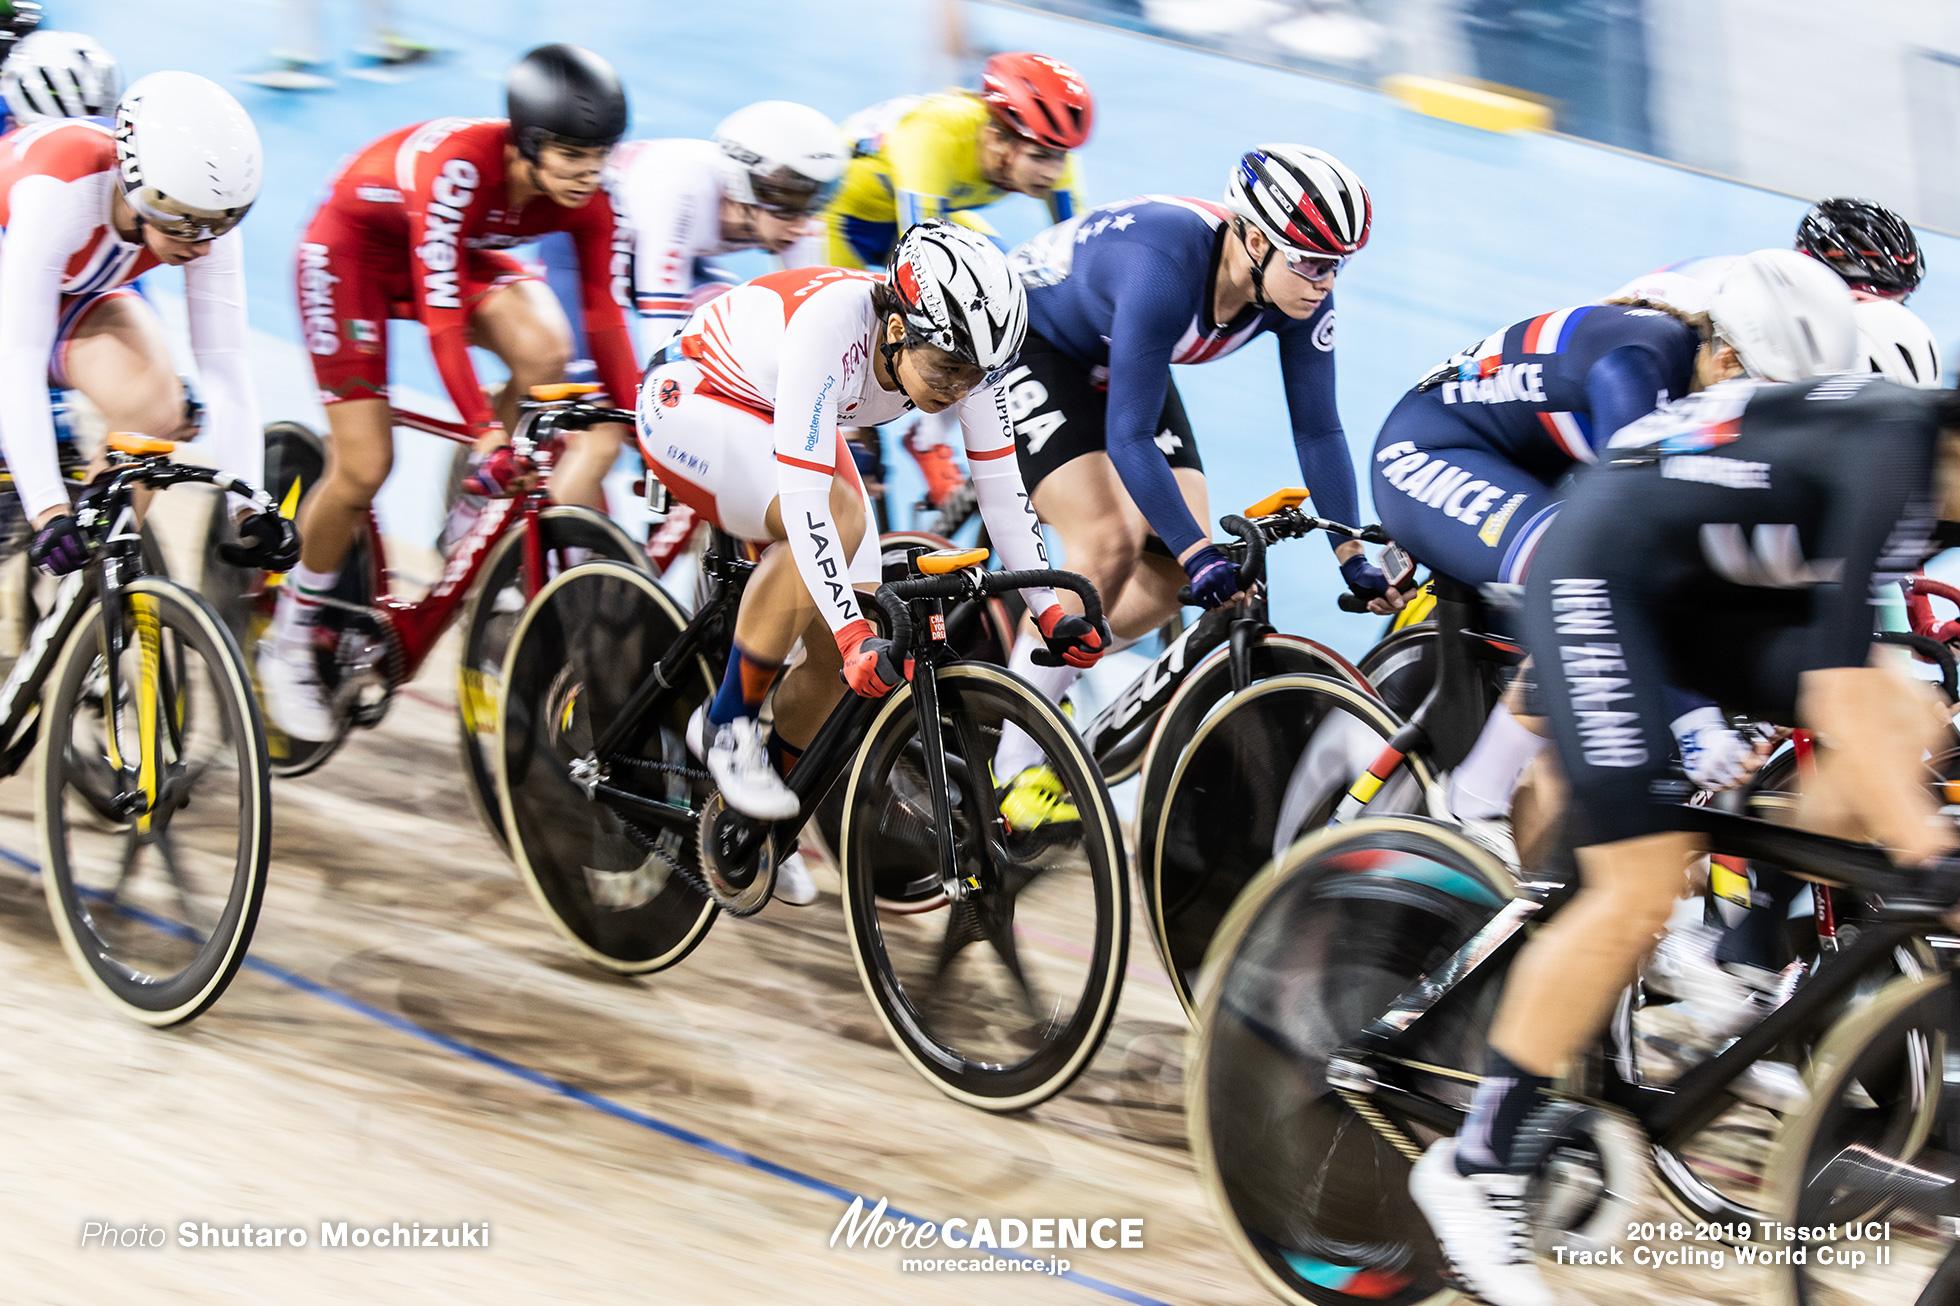 2018-2019 Tissot UCI Track Cycling World Cup II Women's Omnium I Elimination